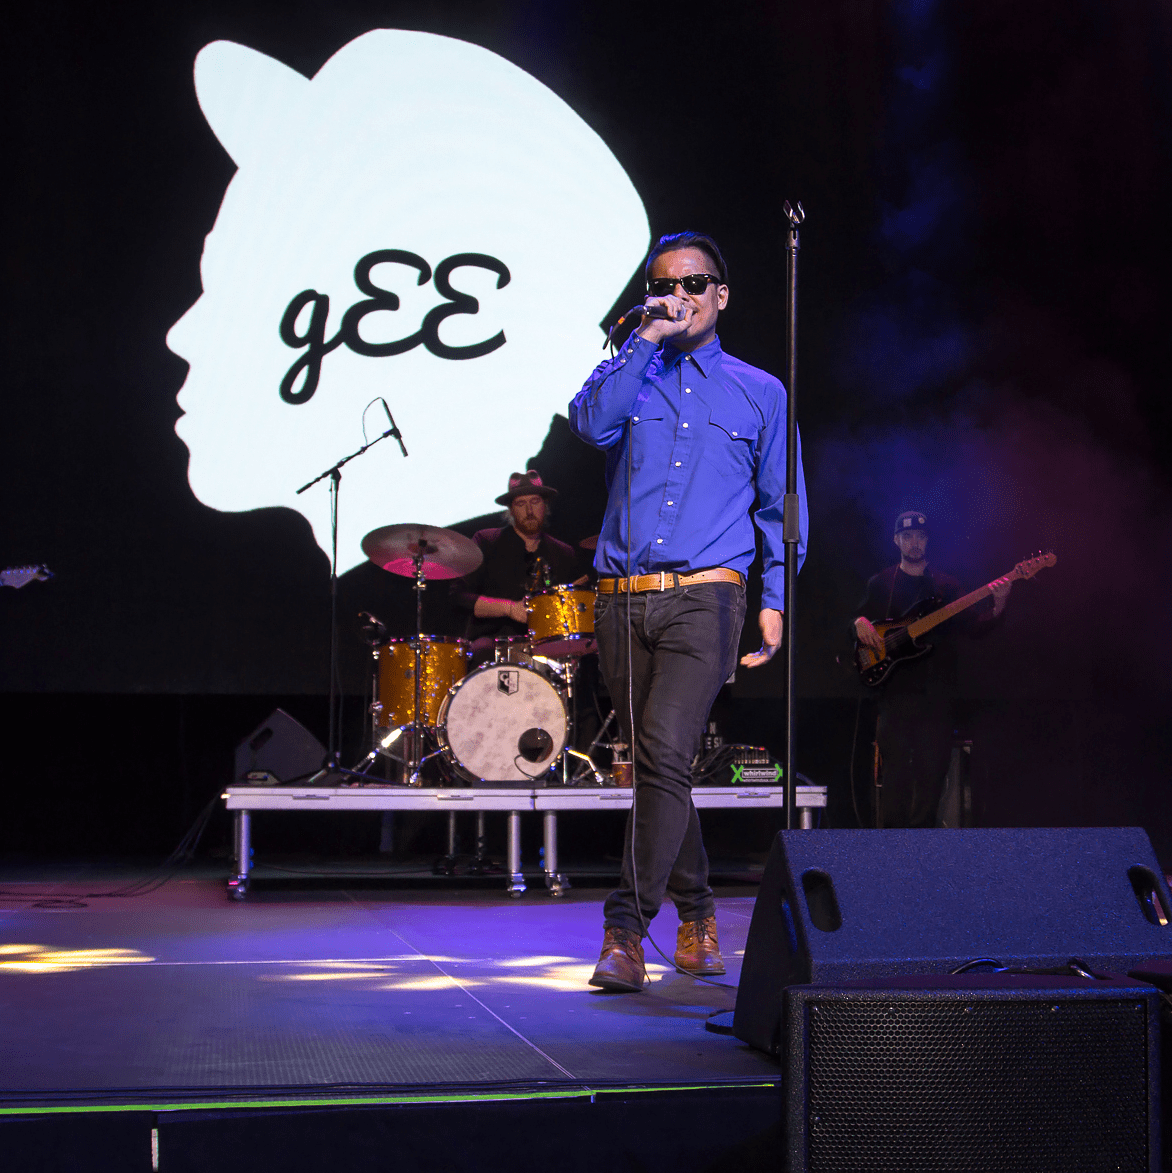 Larry g(EE) at CultureMap Dallas Music Social 2015